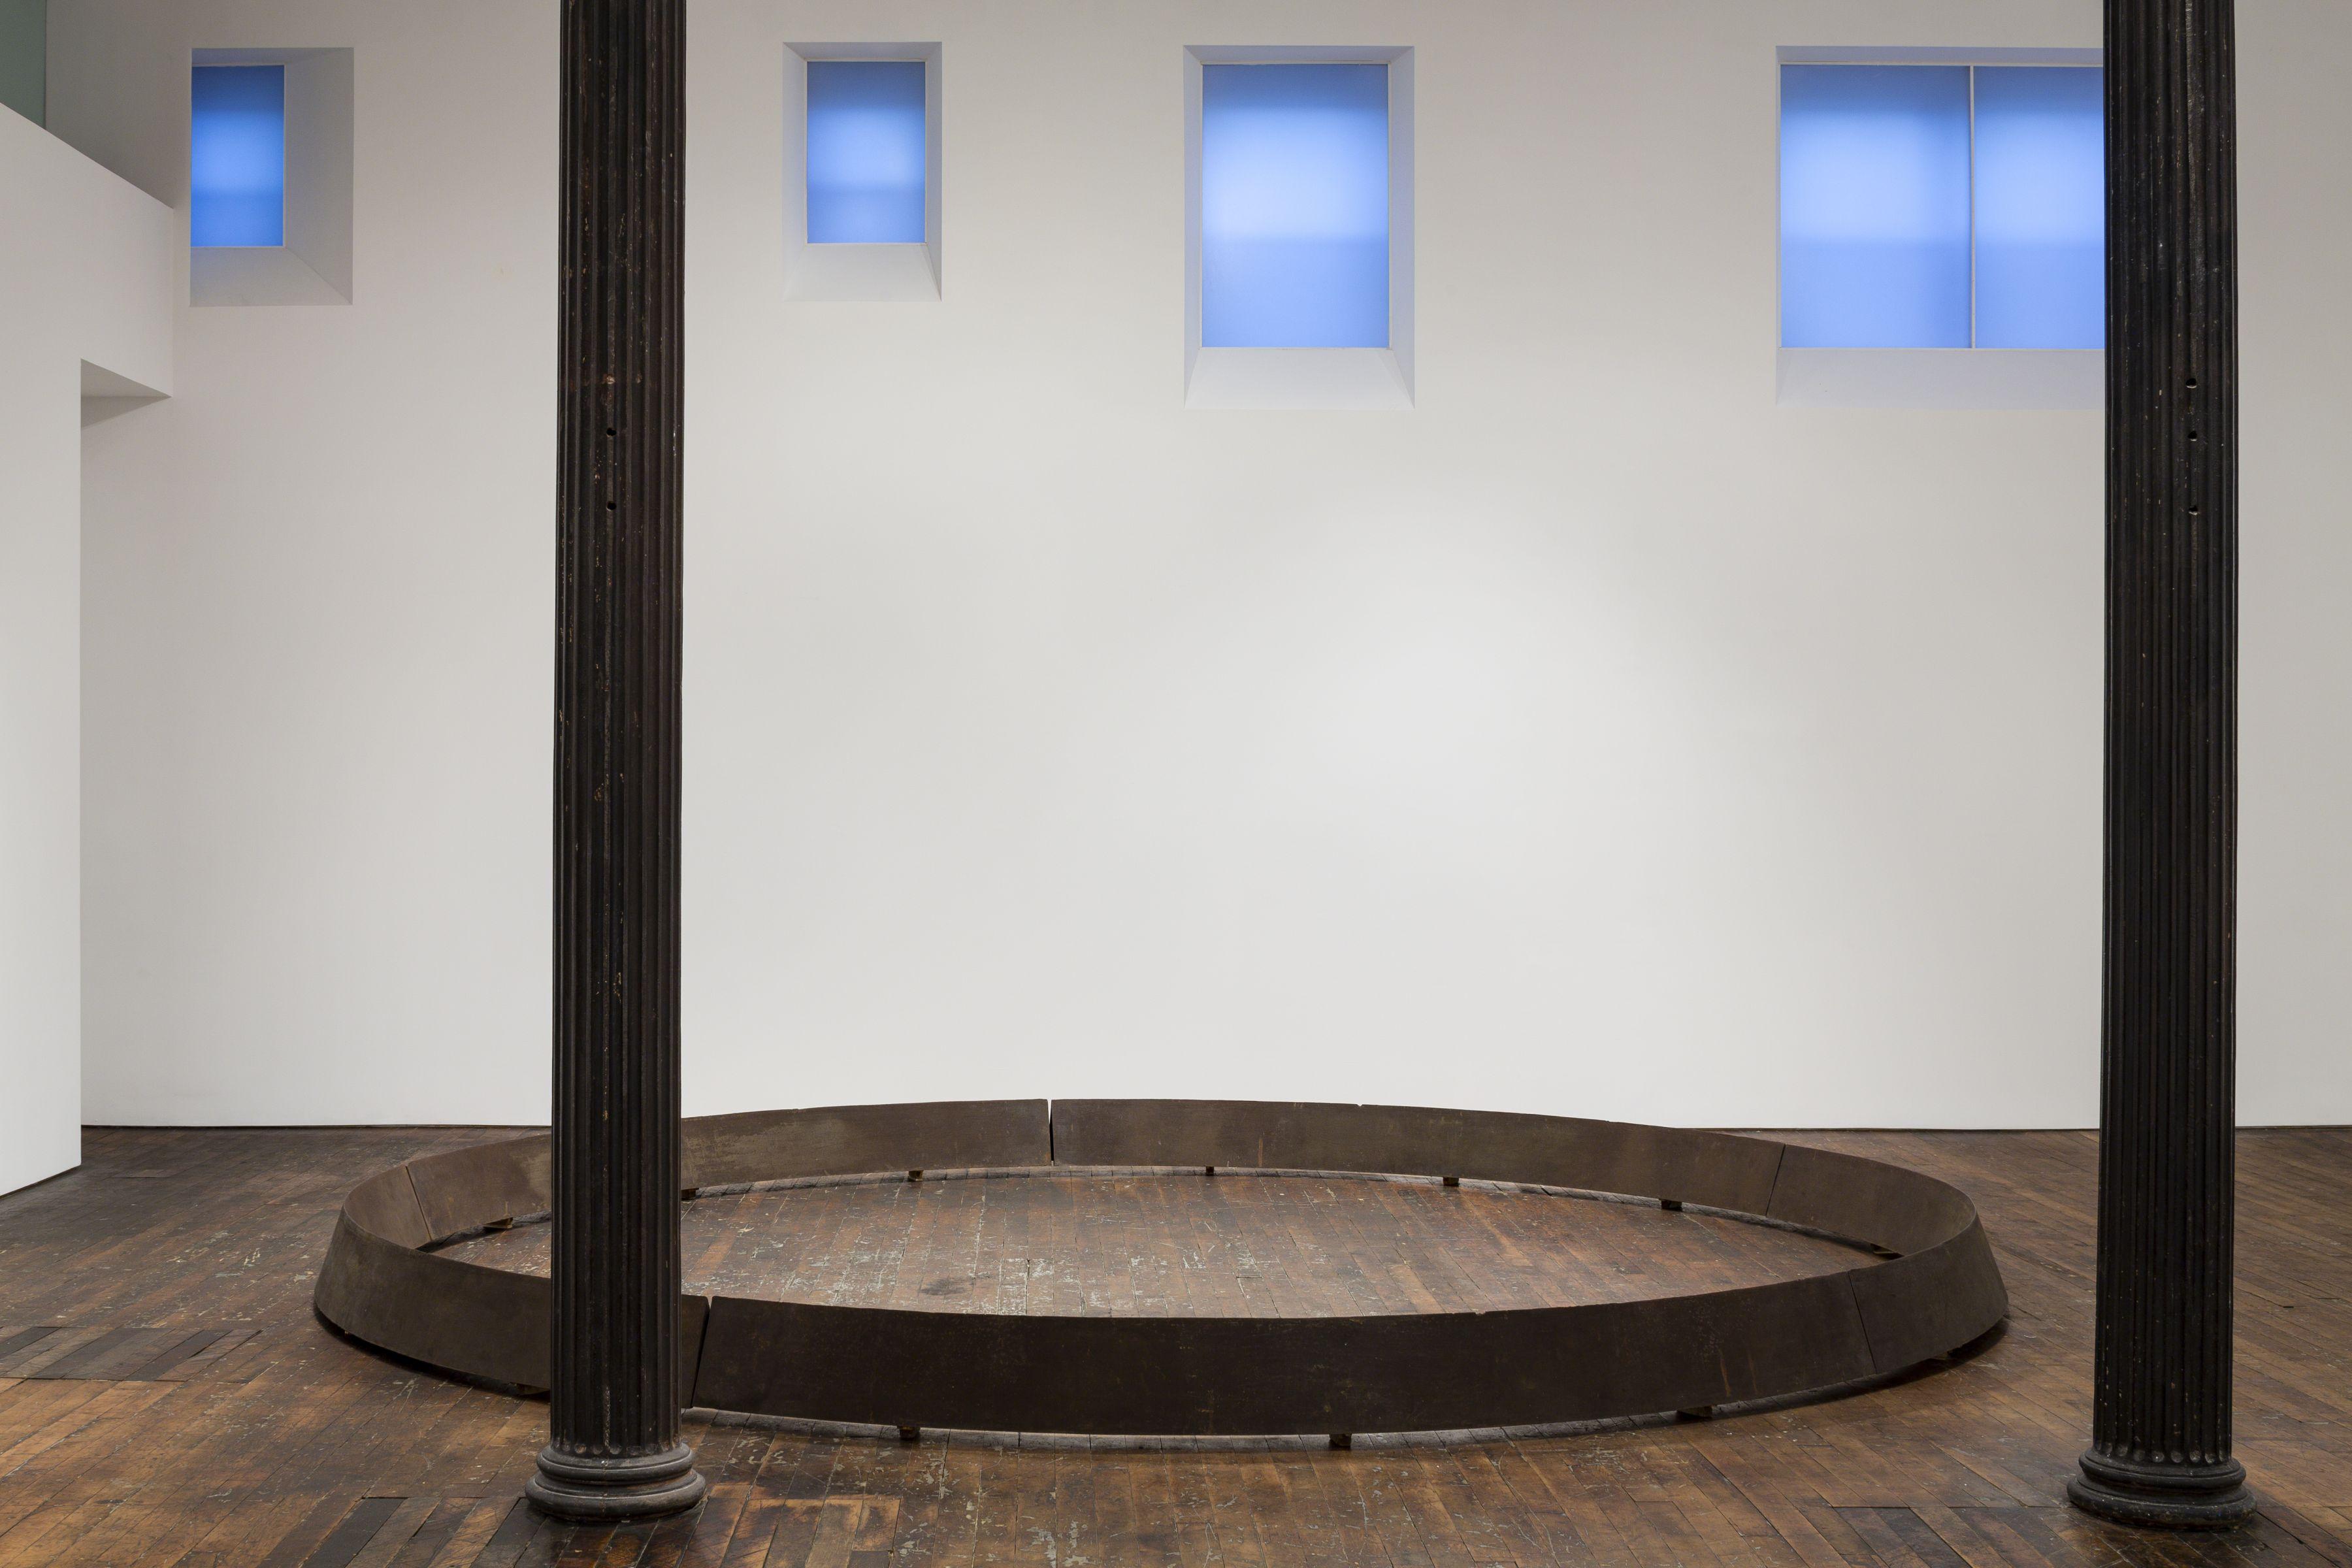 Untitled: Benassi, Bochner, Cabrita Reis, Gober, Nauman, Serra, Sosnowska, Tuttle, Walther– installation view 12